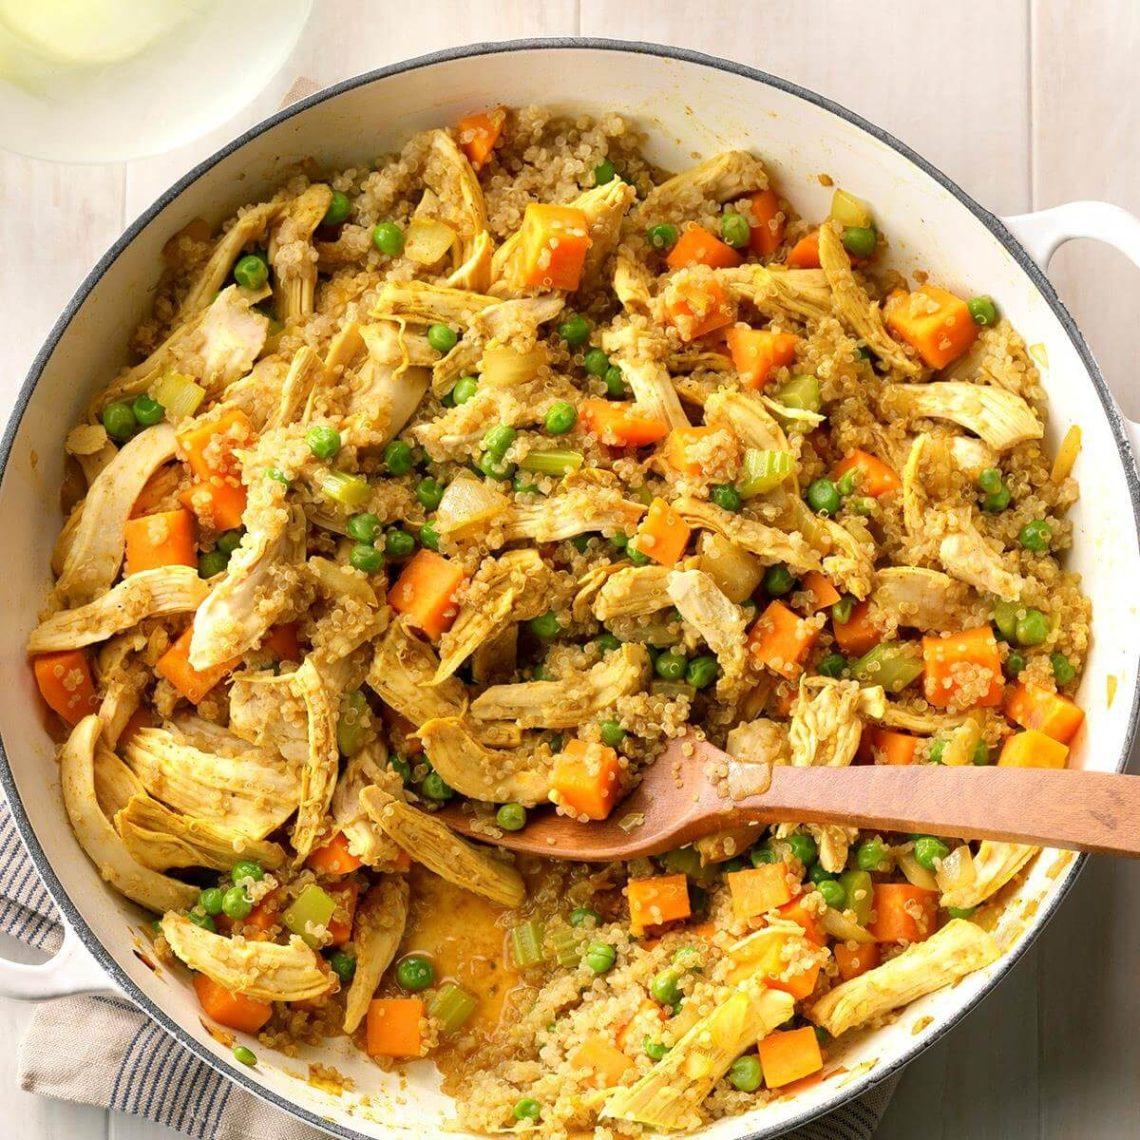 Curried Chicken Skillet Recipe | Taste of Home